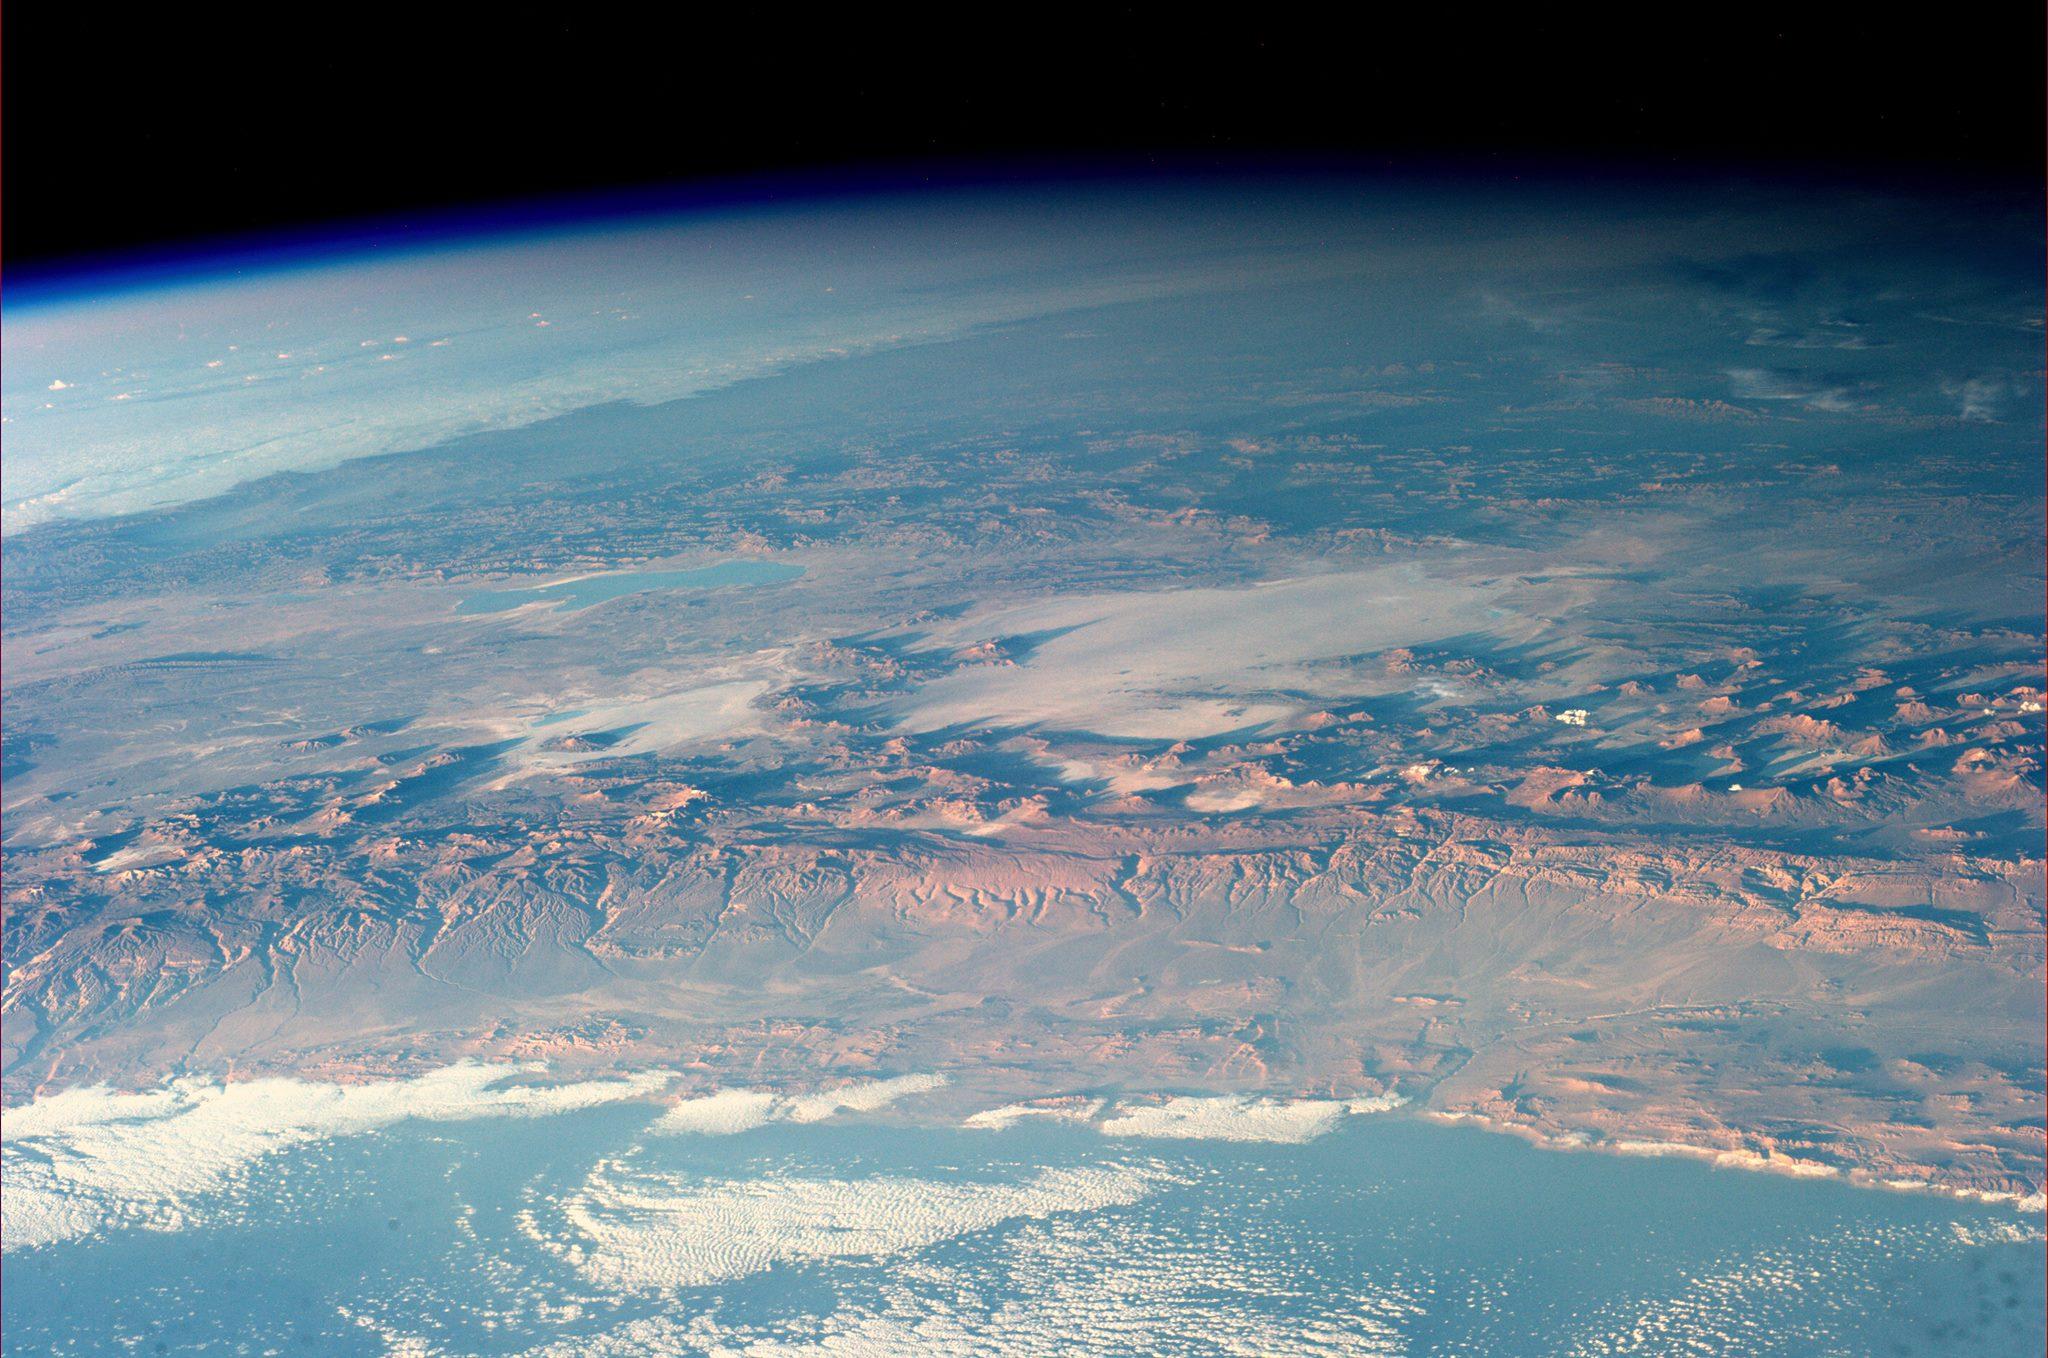 Photos astronaut Alexander Gerst 18